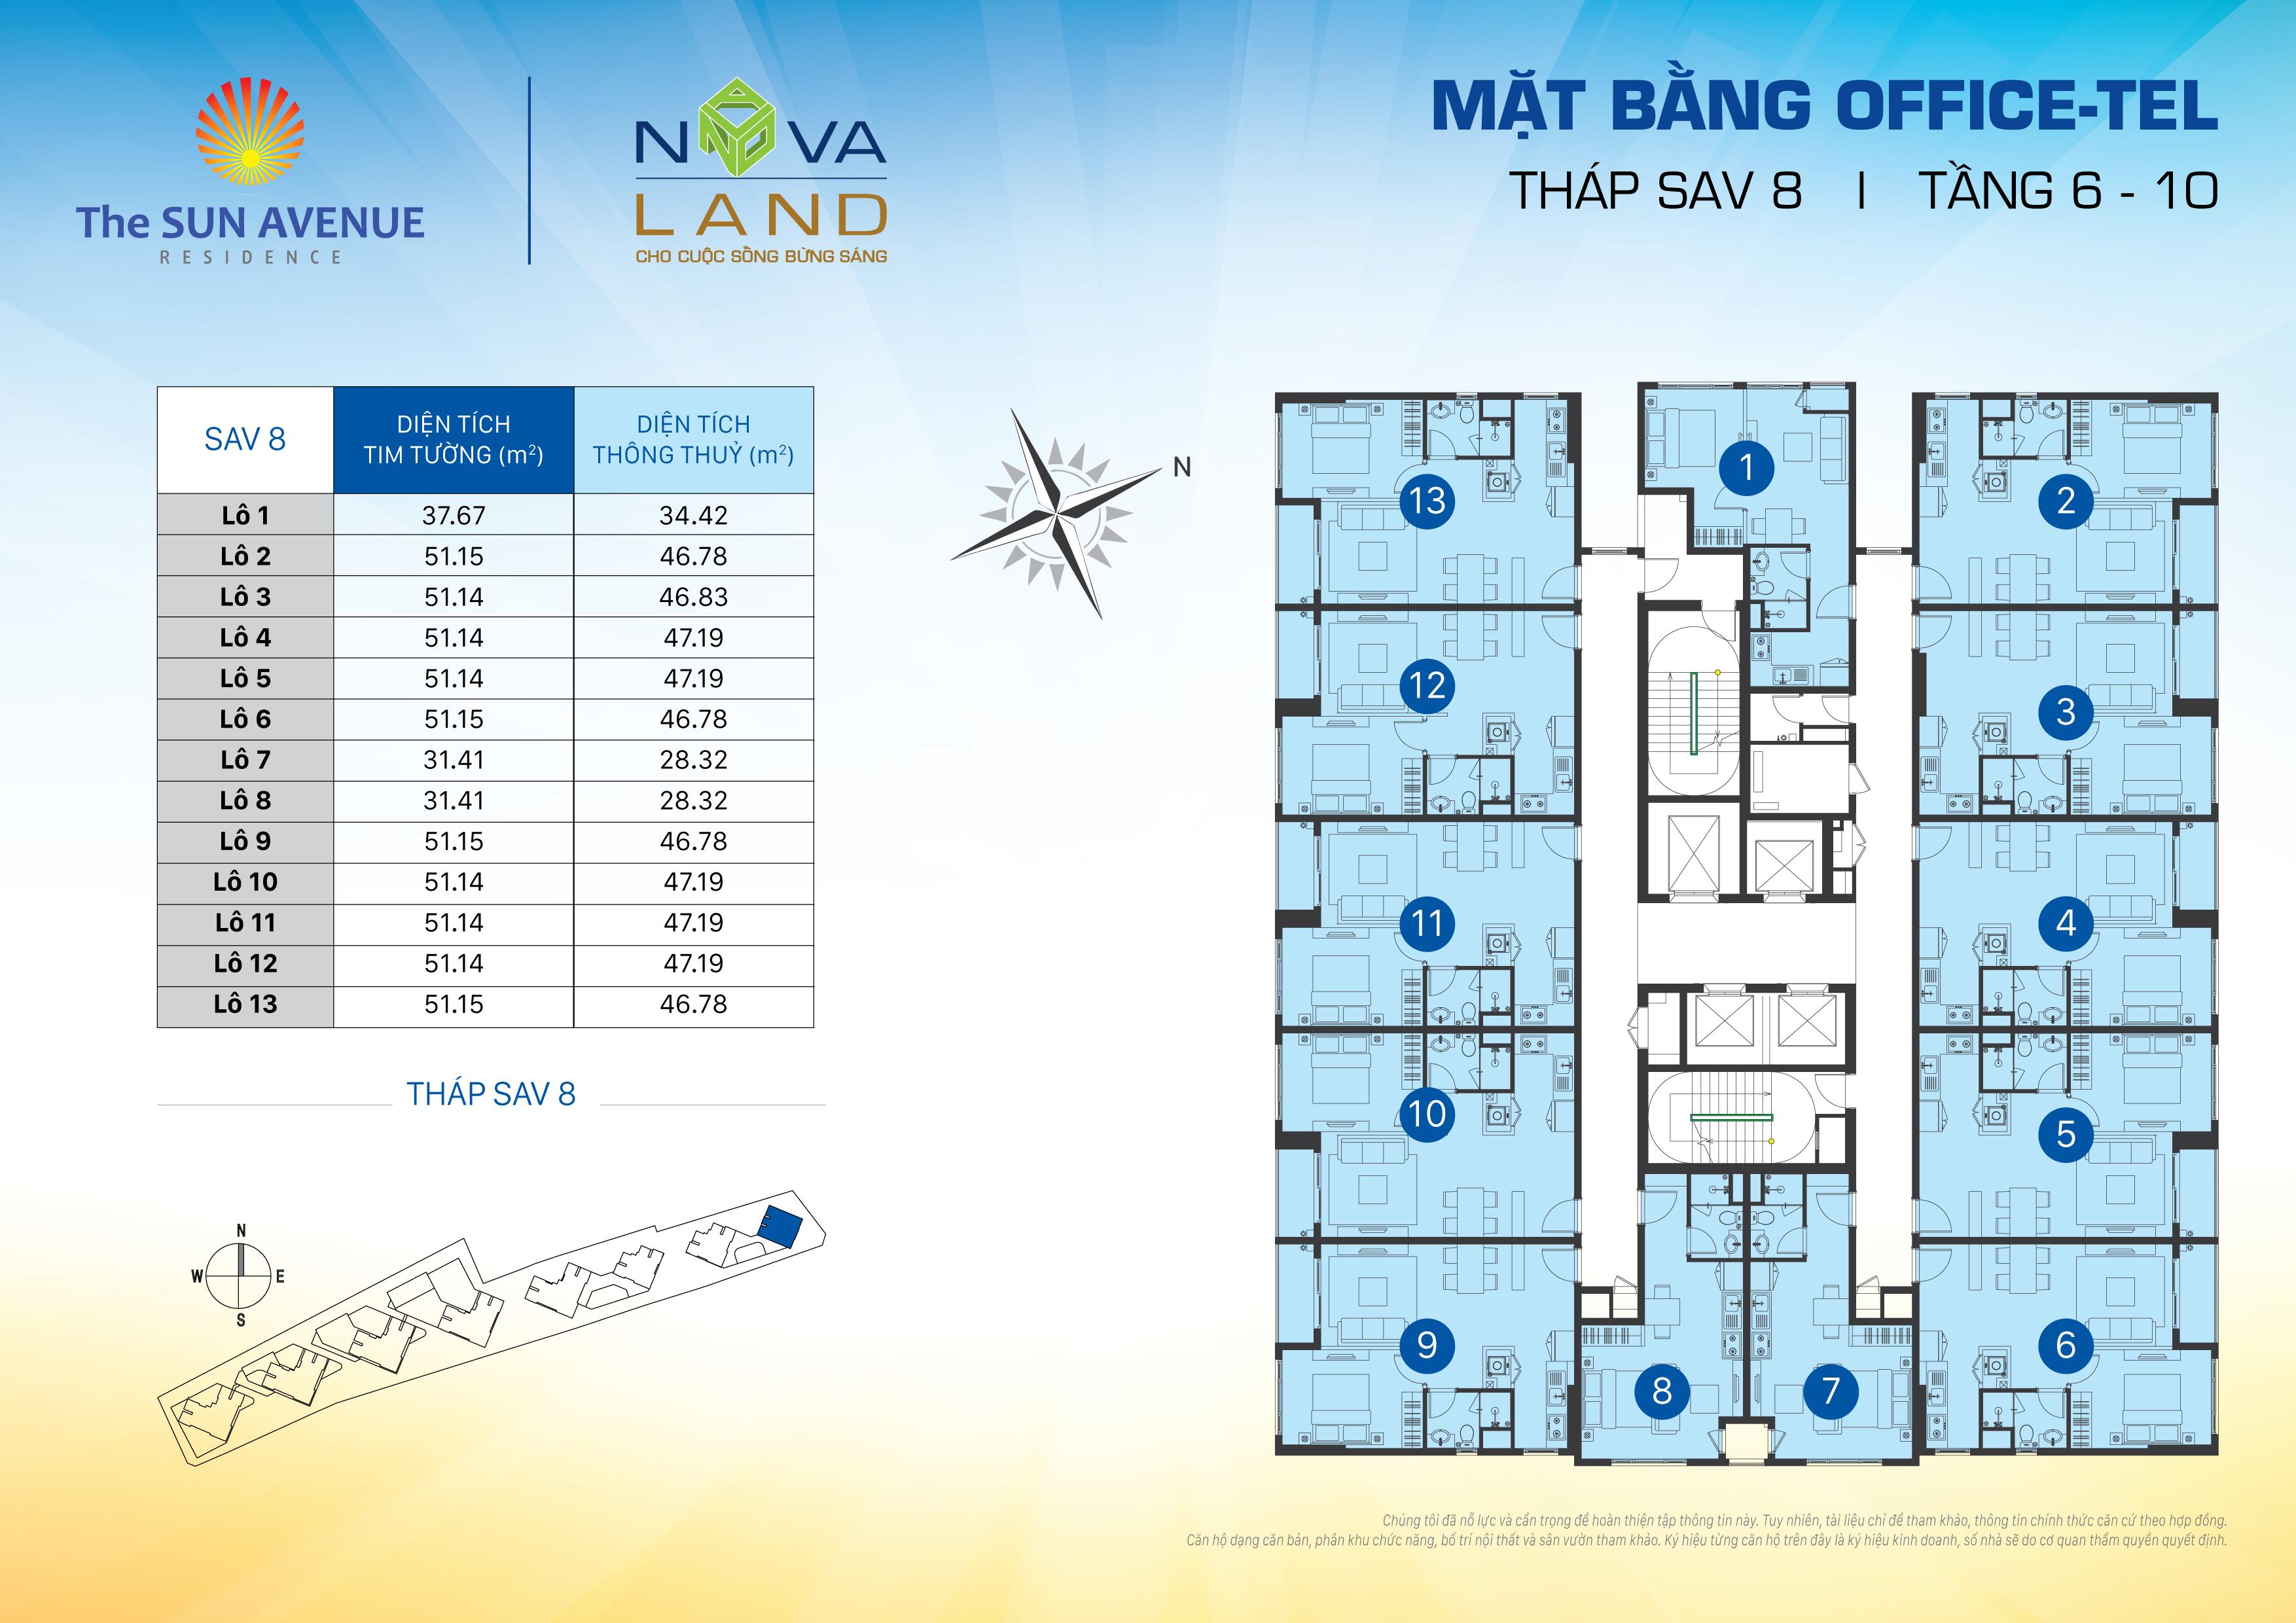 OT Sav 8 Floor 6 10 - The Sun Avenue